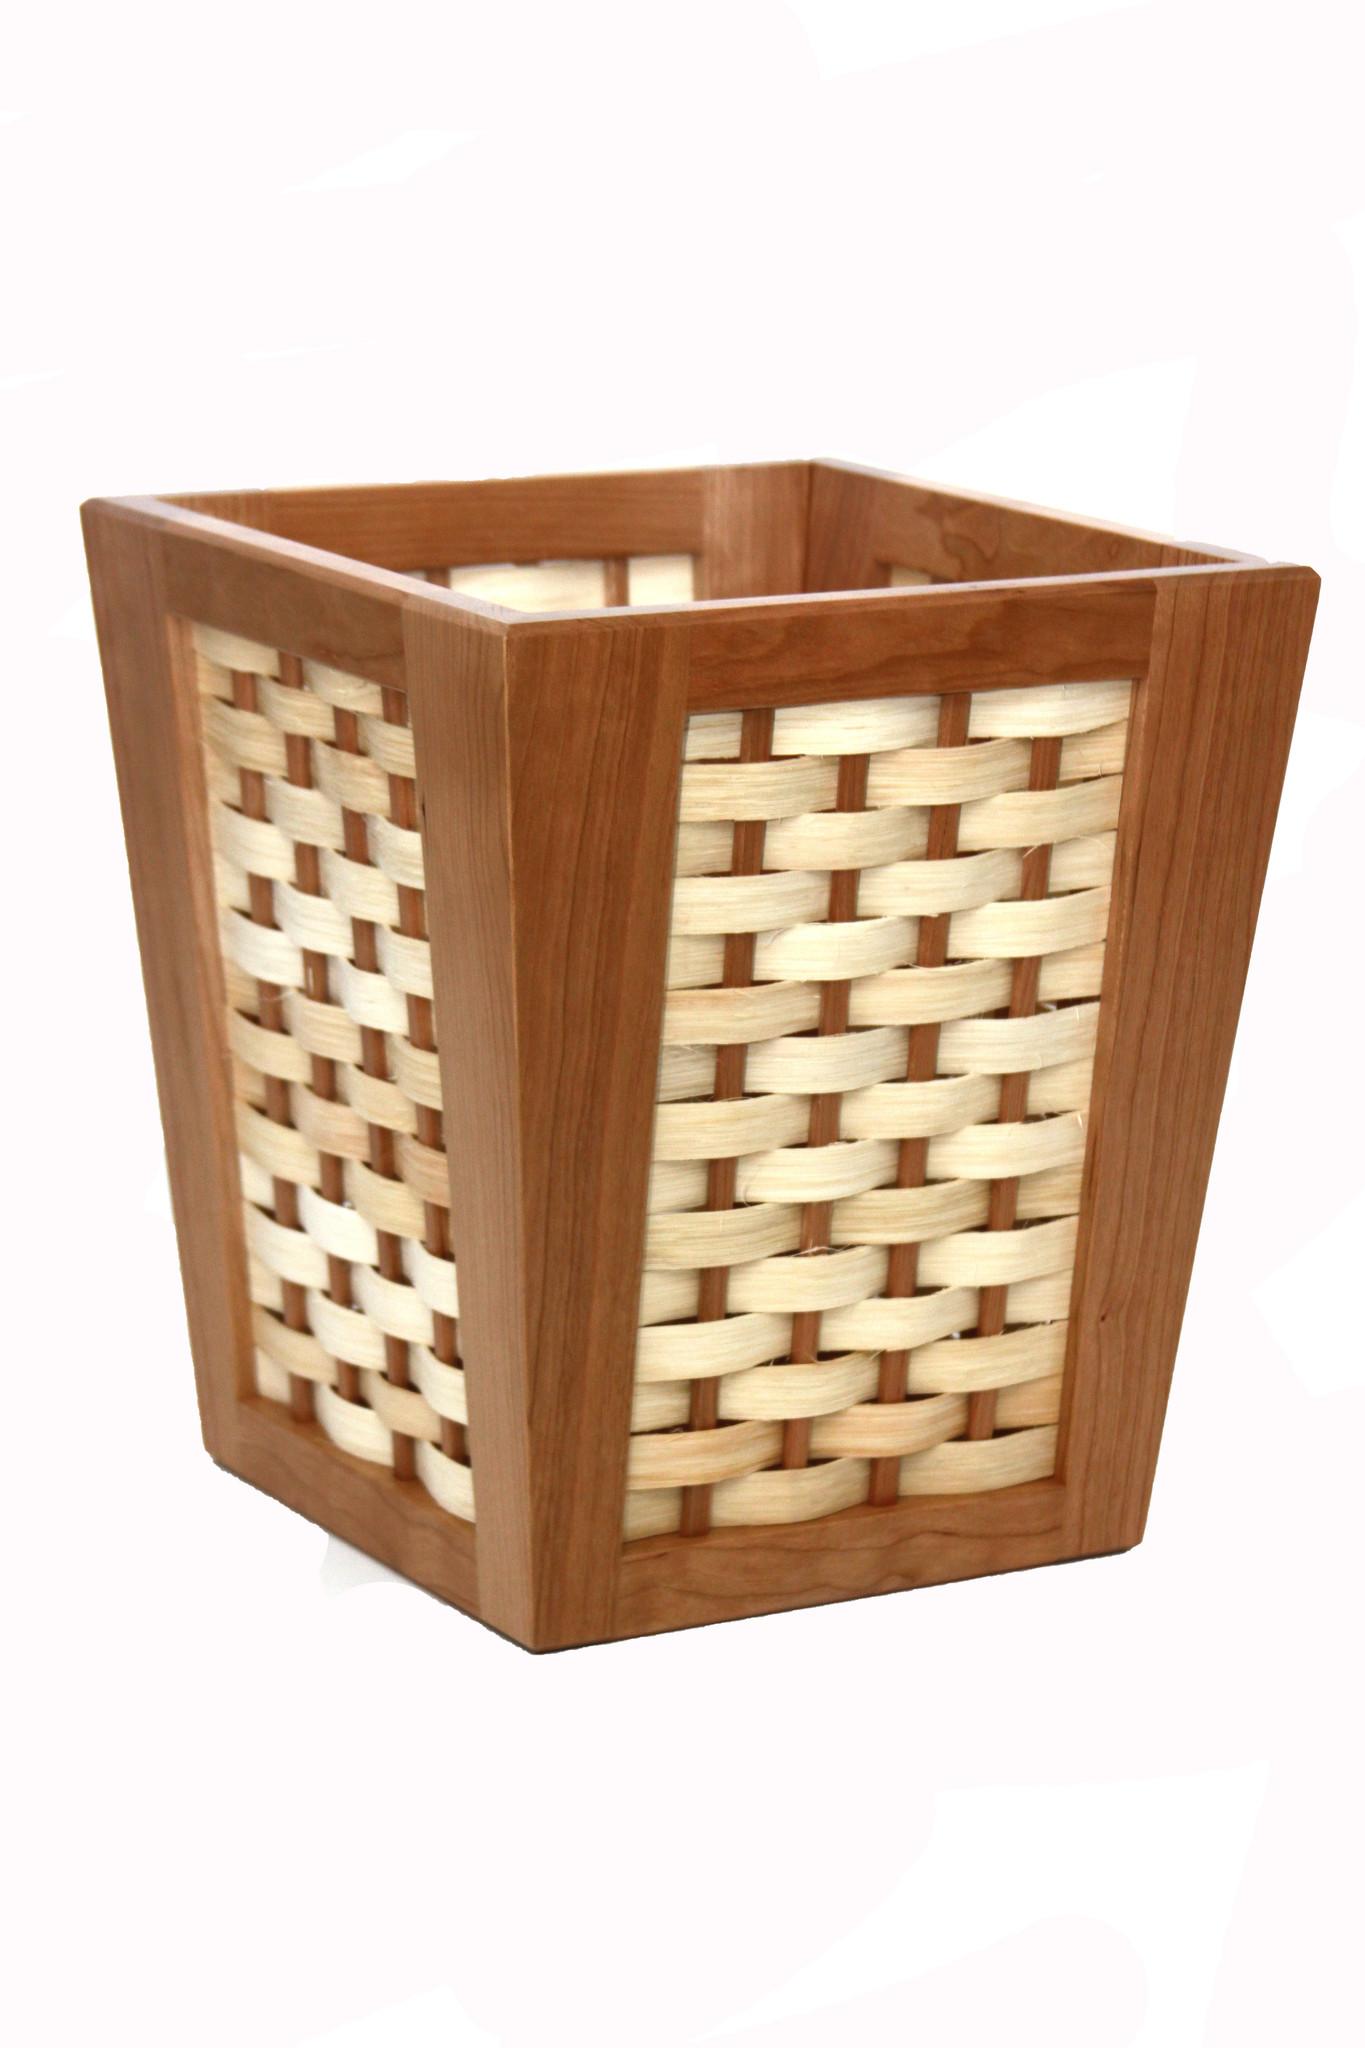 4 Square Basket Cherry-1